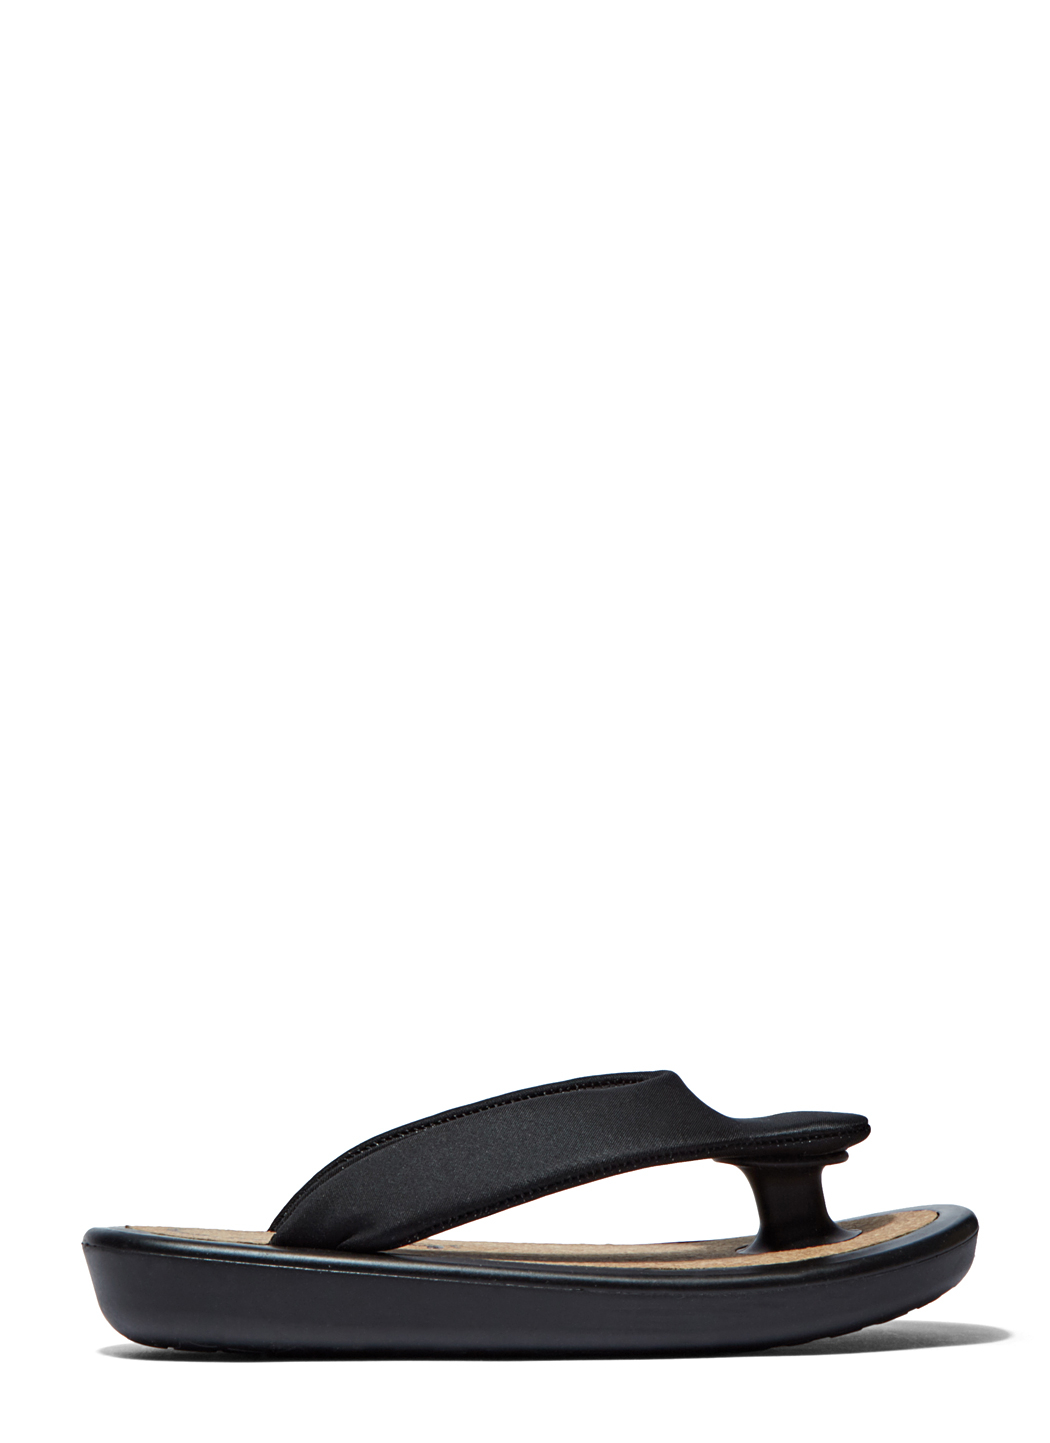 Eytys Unisex Jojo Sandals In Black In Black For Men Lyst